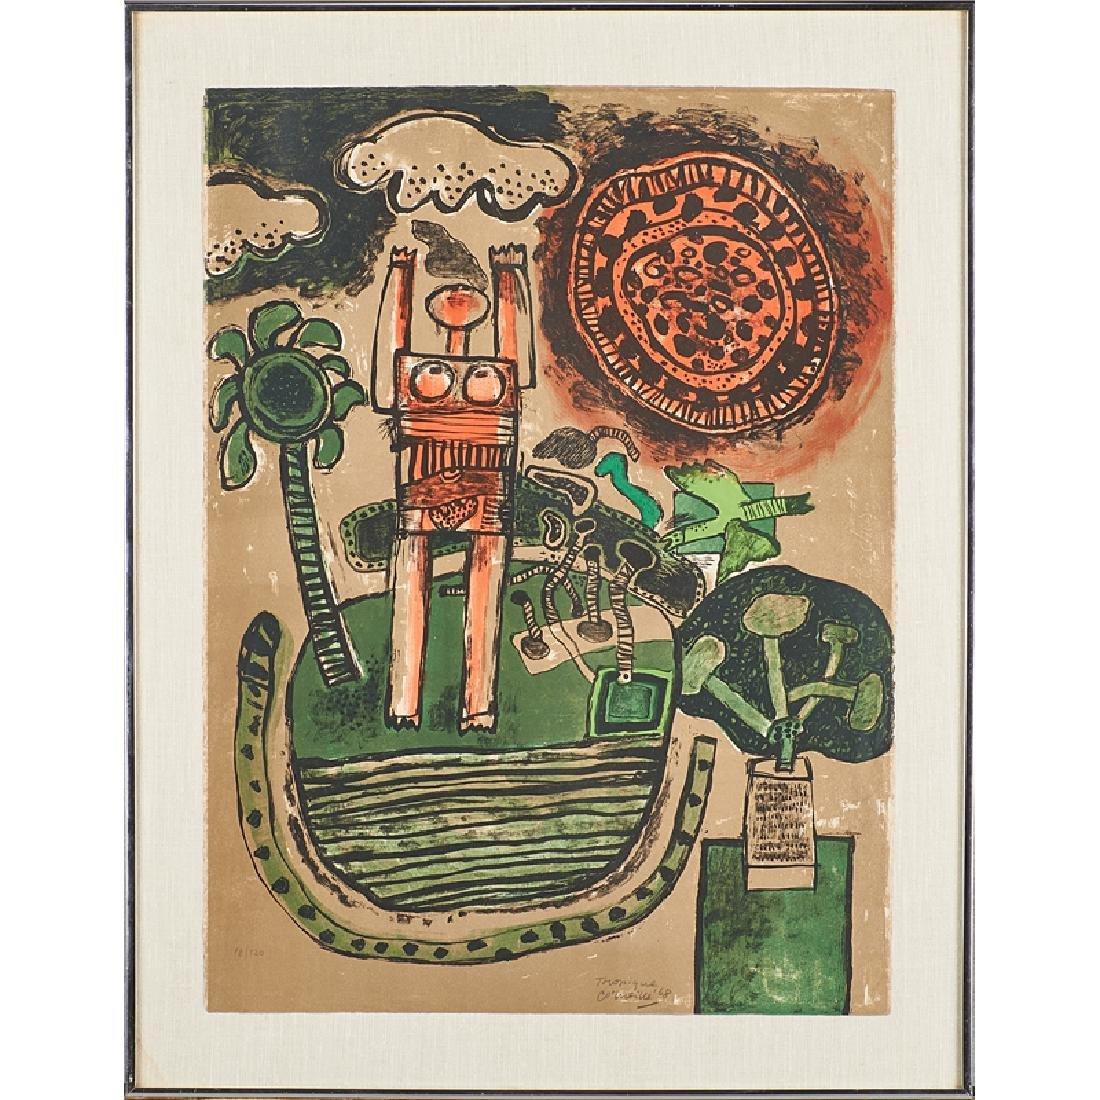 GUILLAUME CORNEILLE (Dutch, 1922-2010)